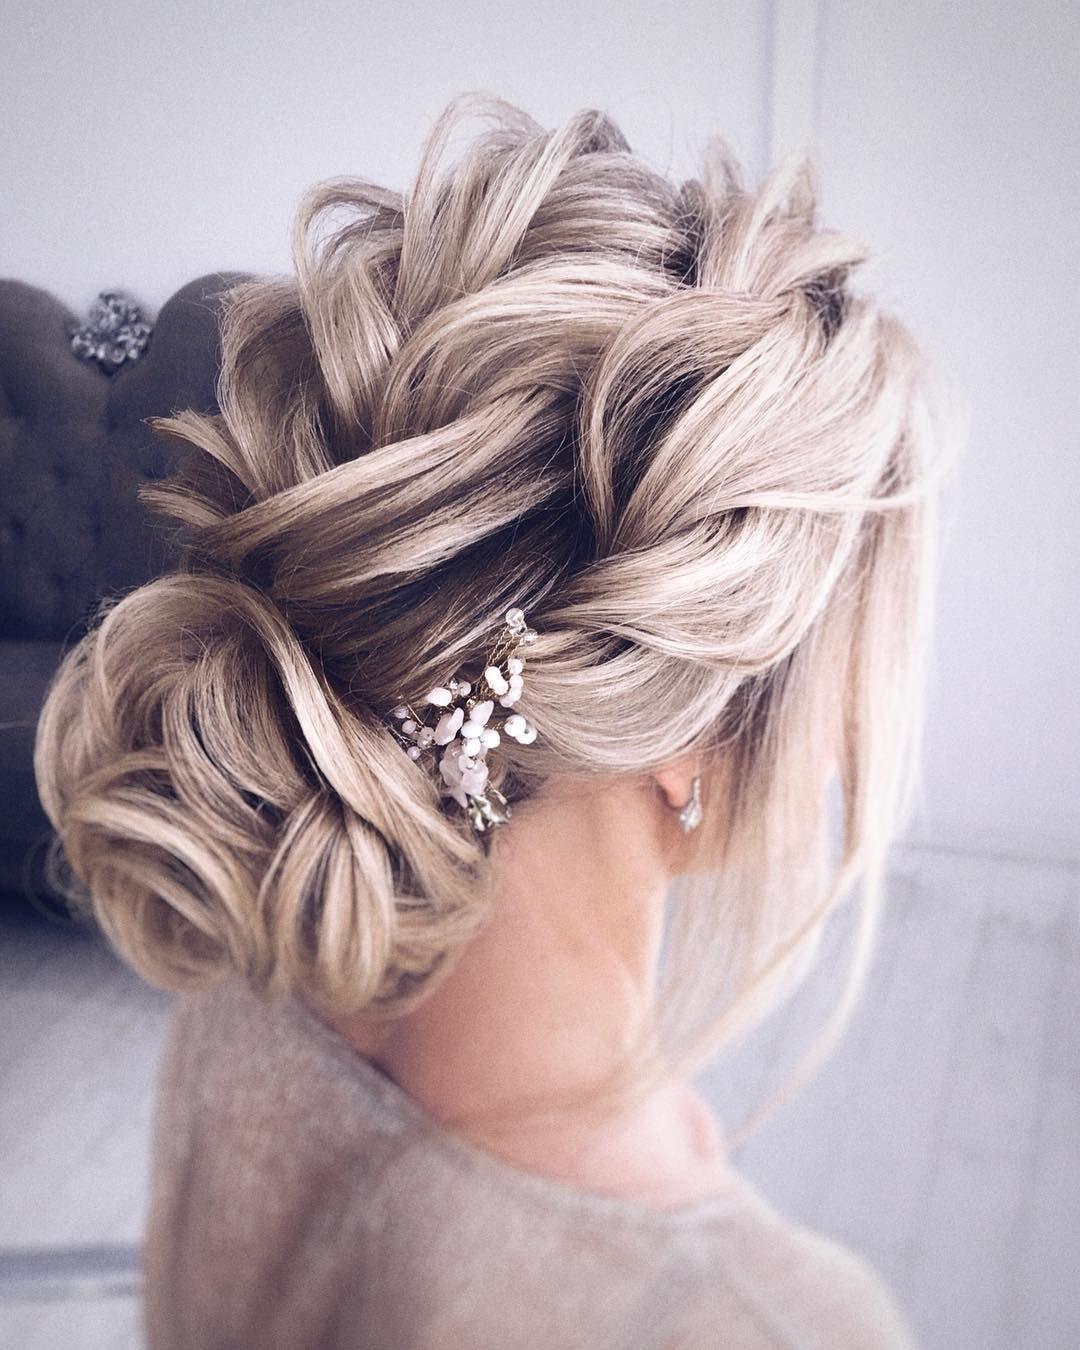 Updo braided updo hairstyle swept back bridal hairstyle updo